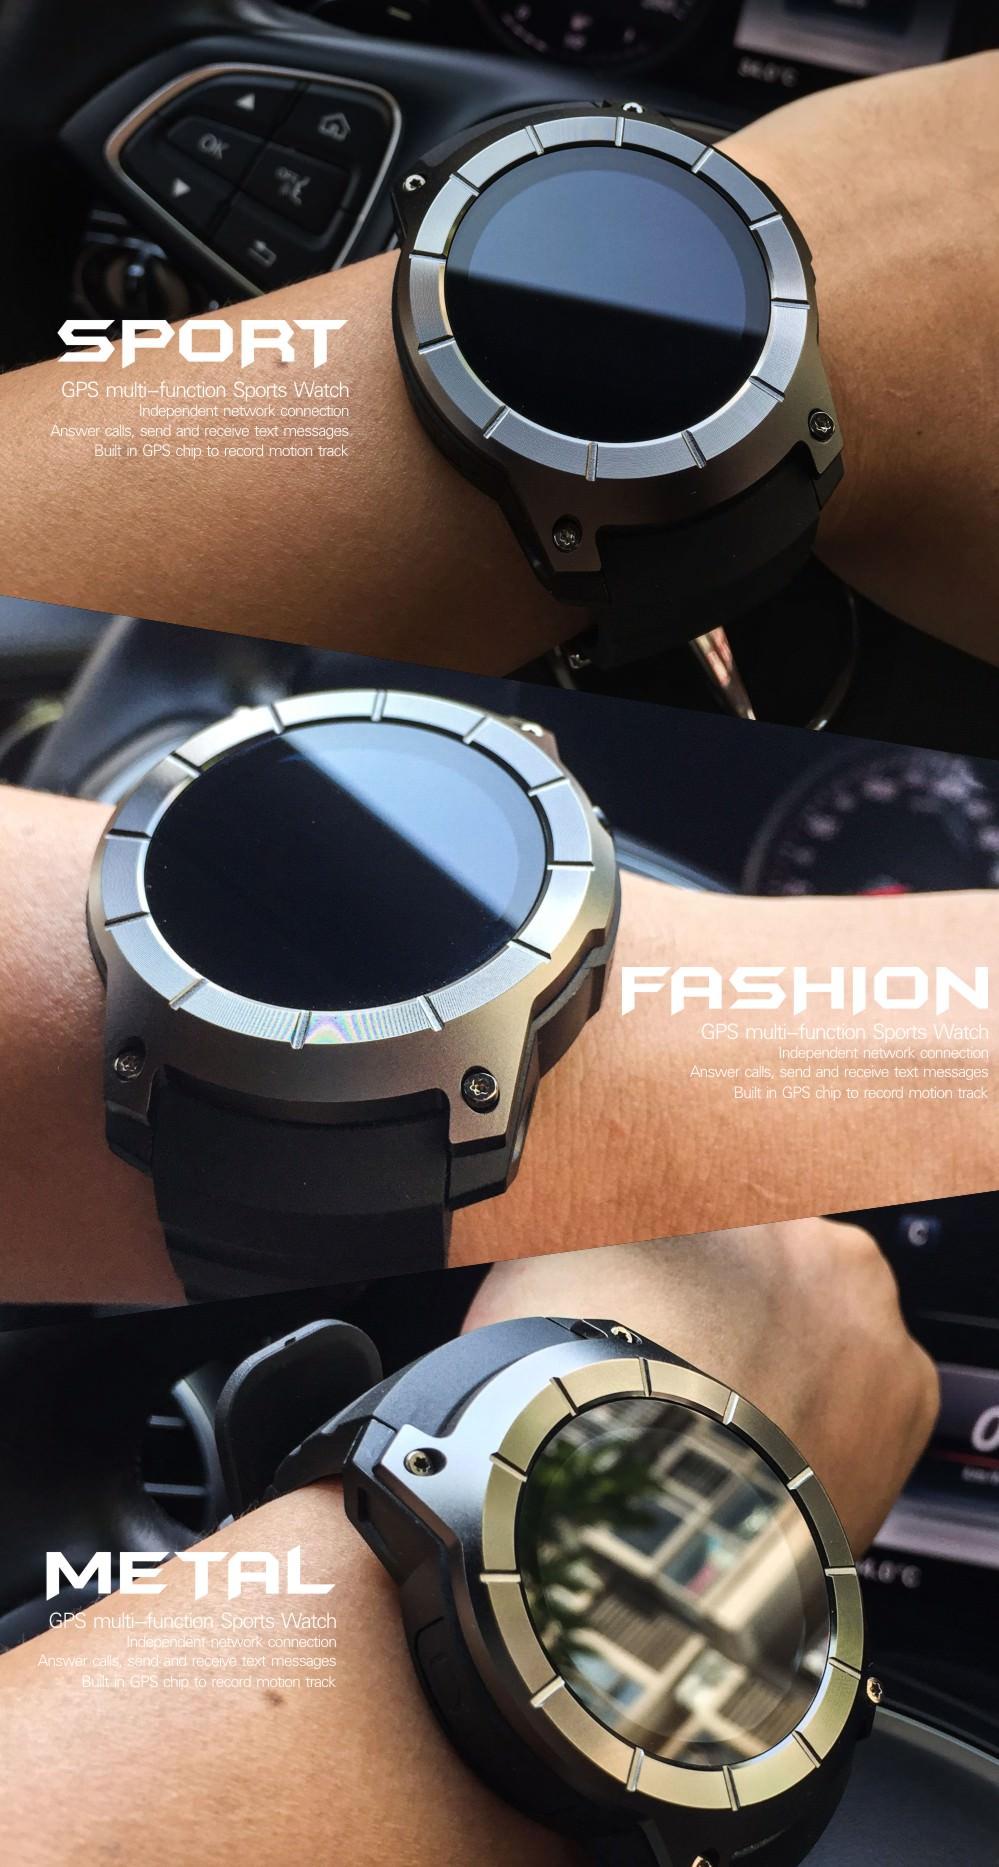 s958 gps 1.3inch smartwatch phone price